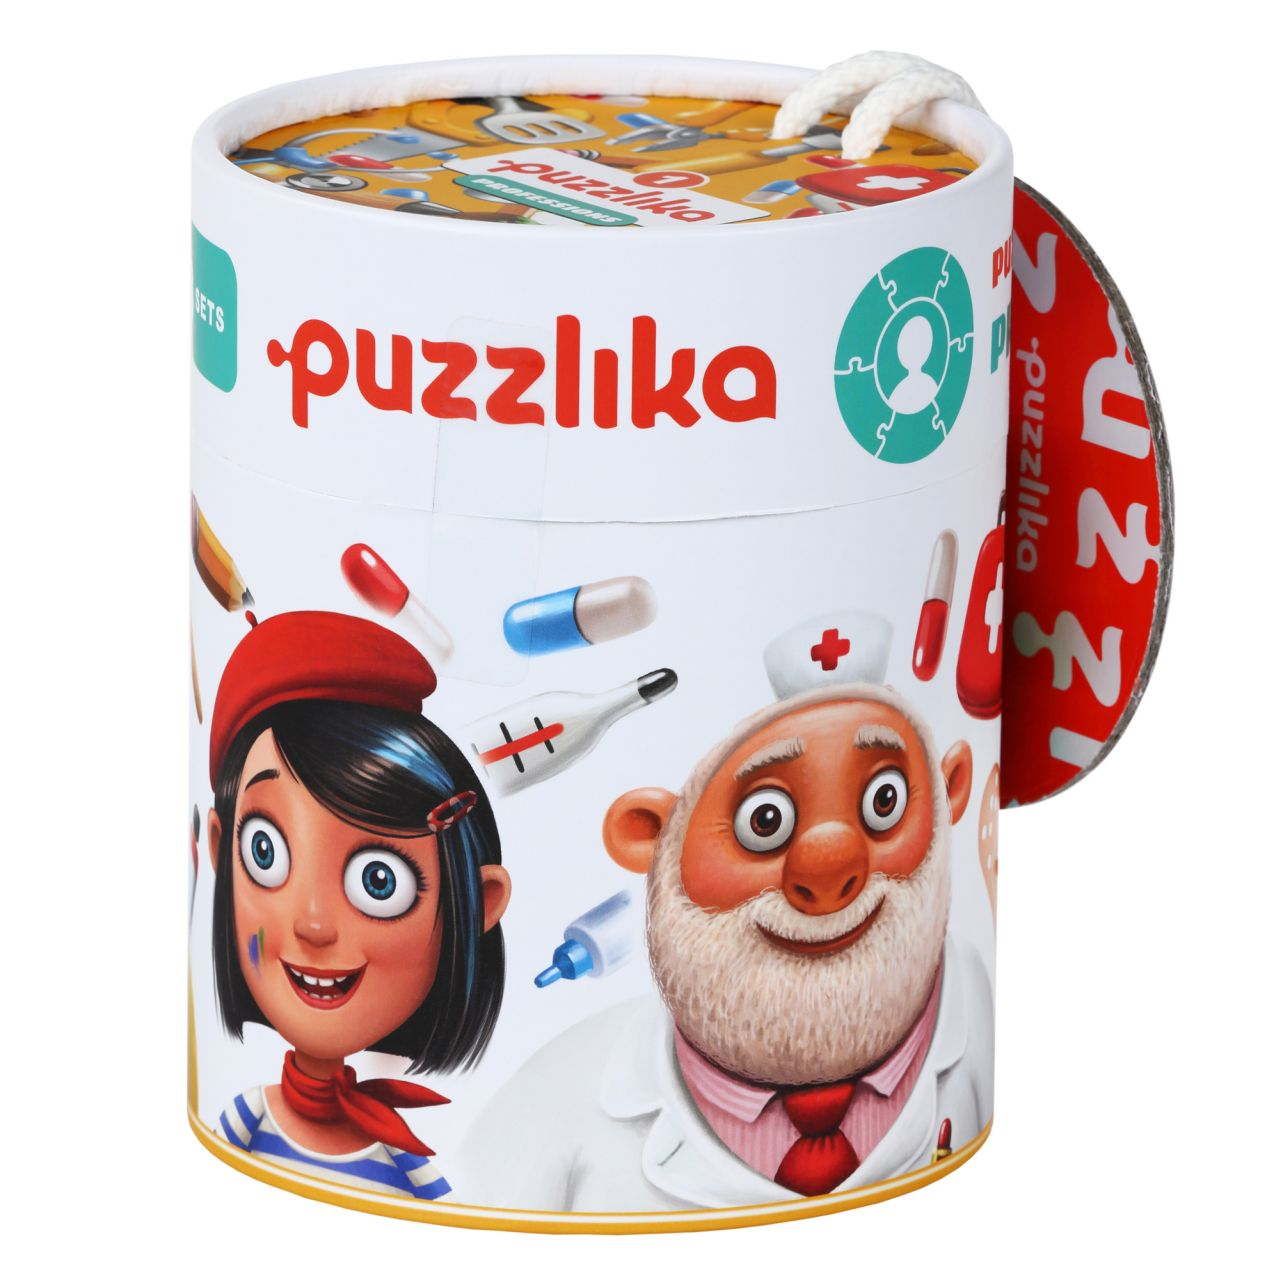 Puzzlika 13517 Profese 1 - naučné puzzle 21 dílků